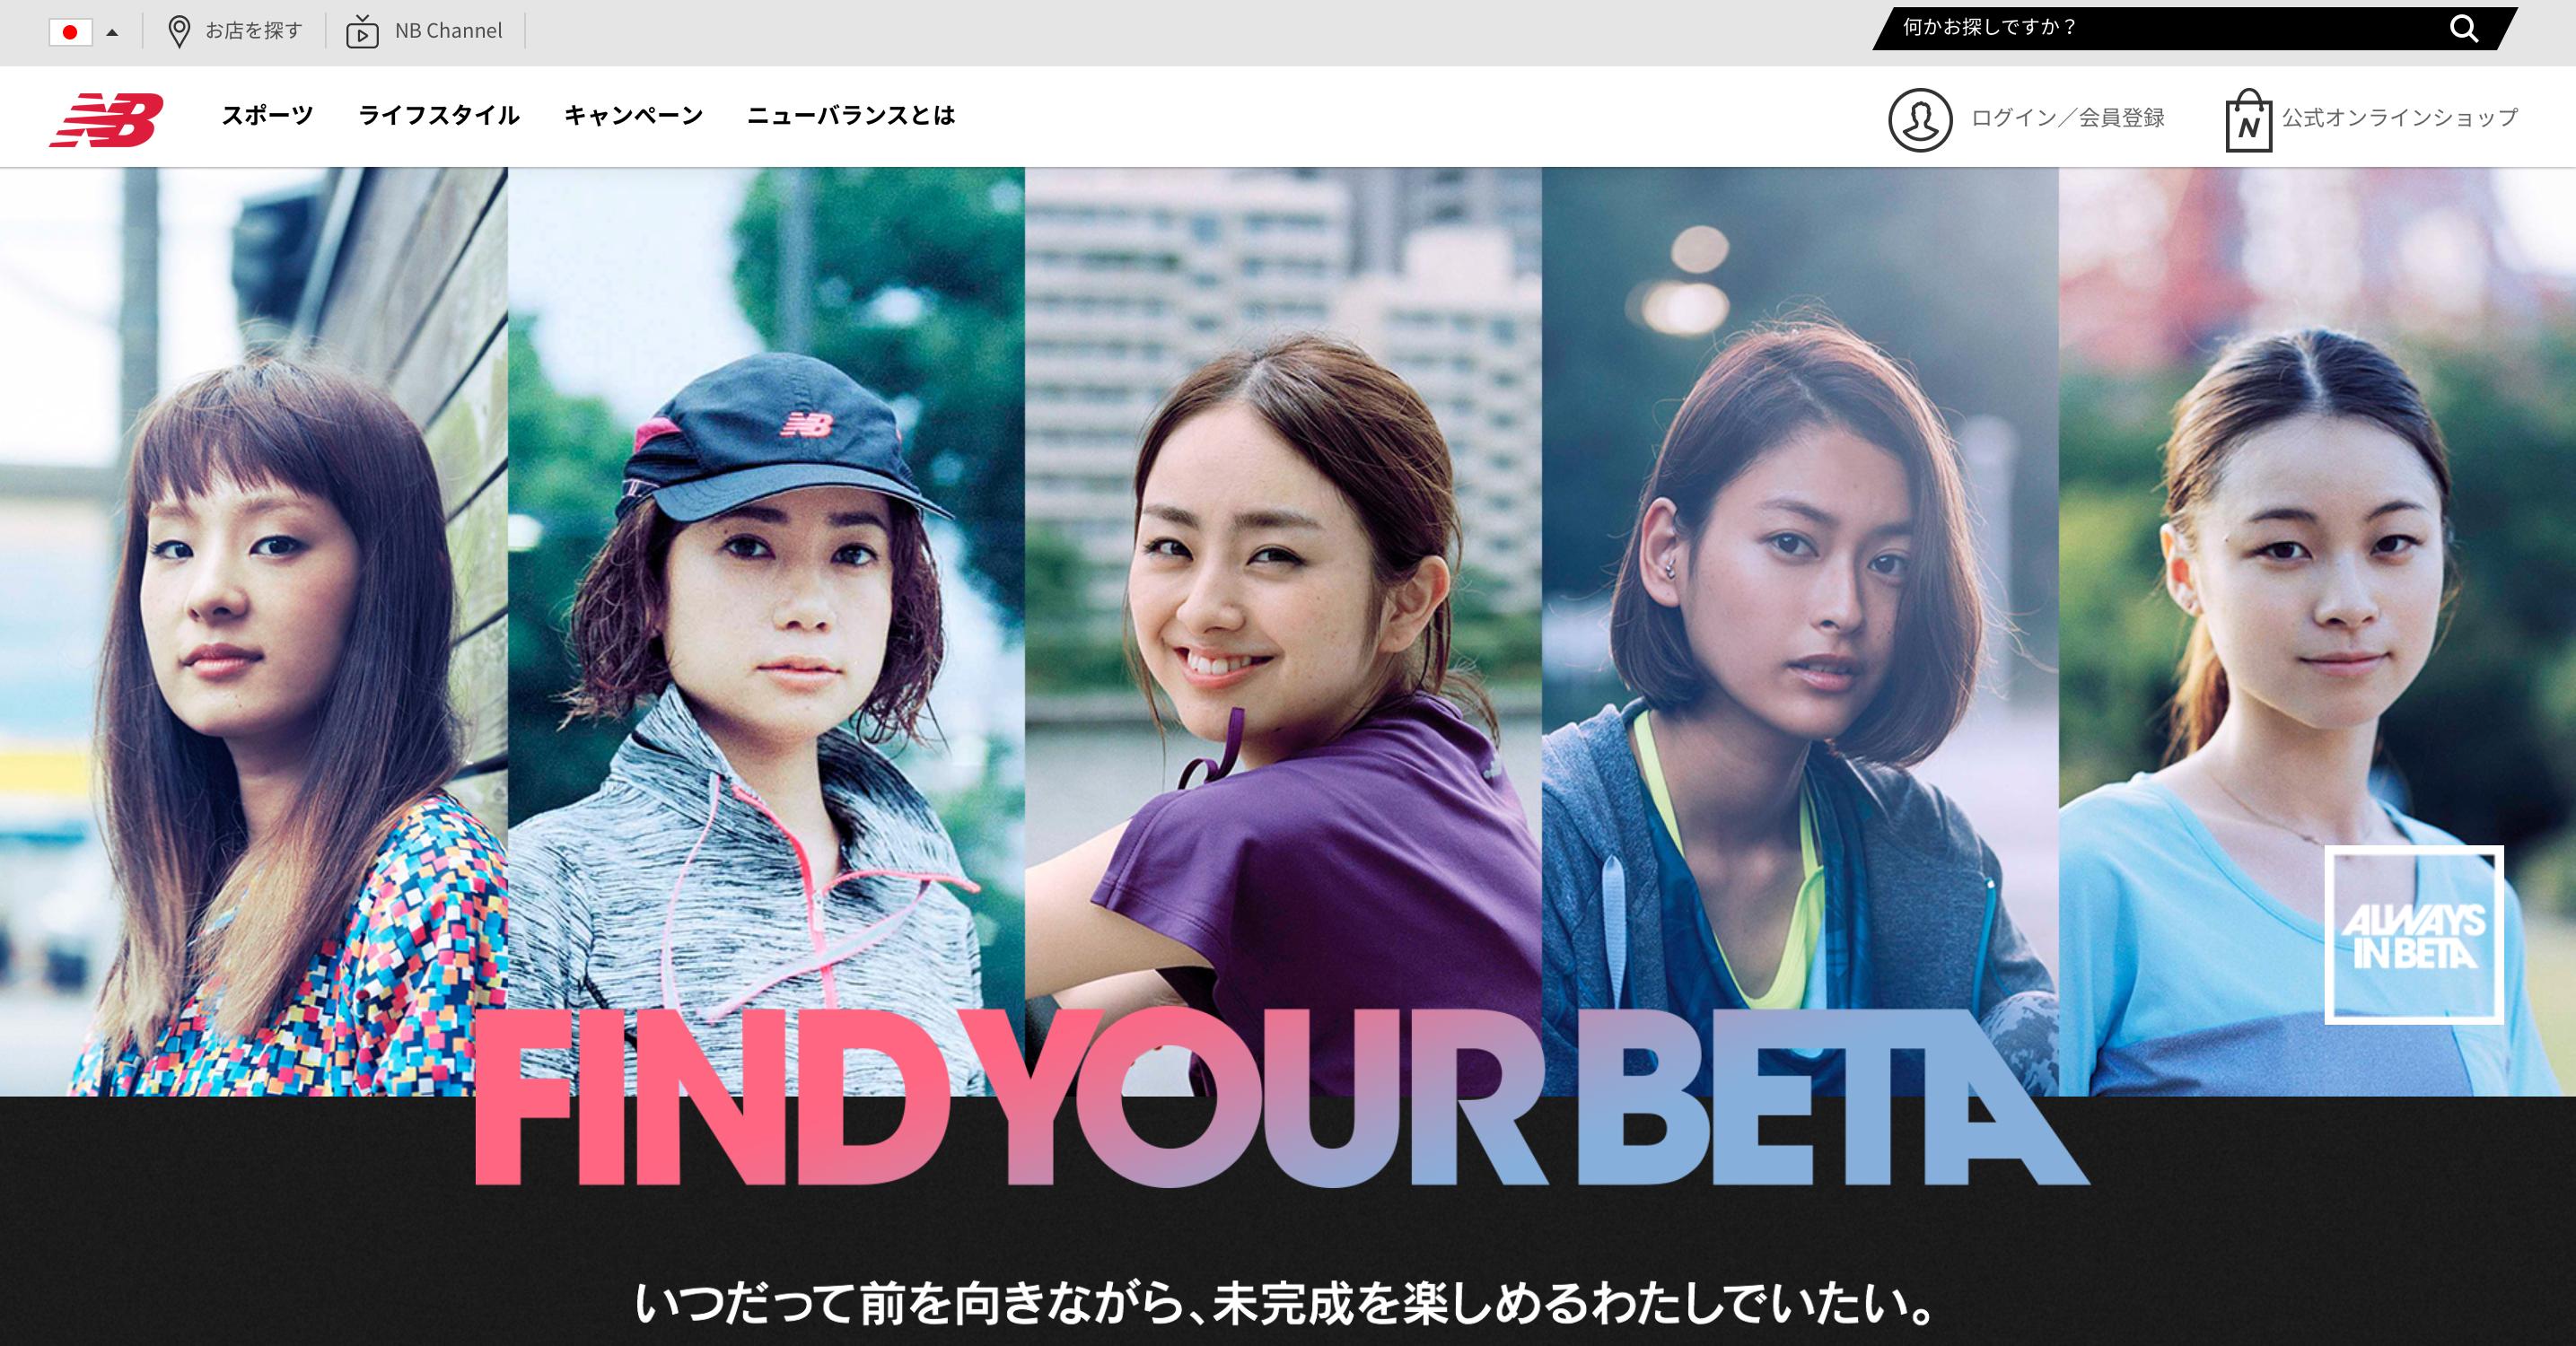 New Balance website